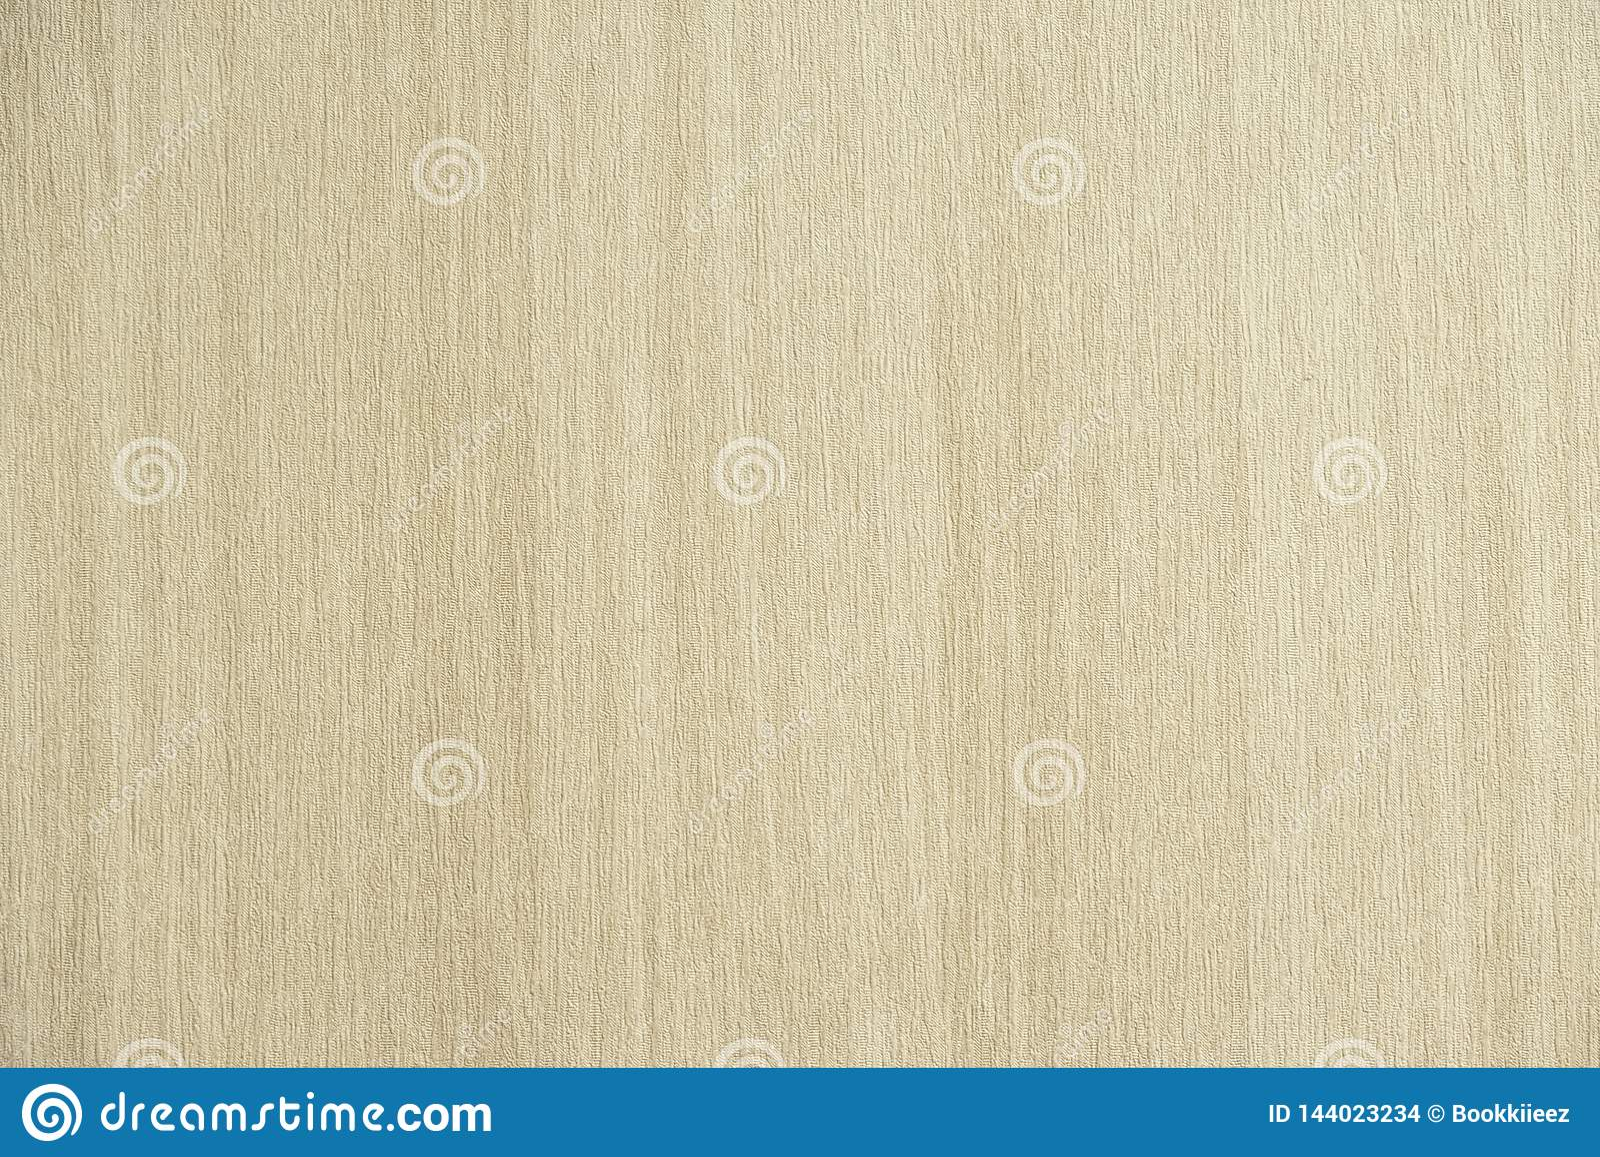 Wood texture wallpaper. Creamy wooden wallpaper.